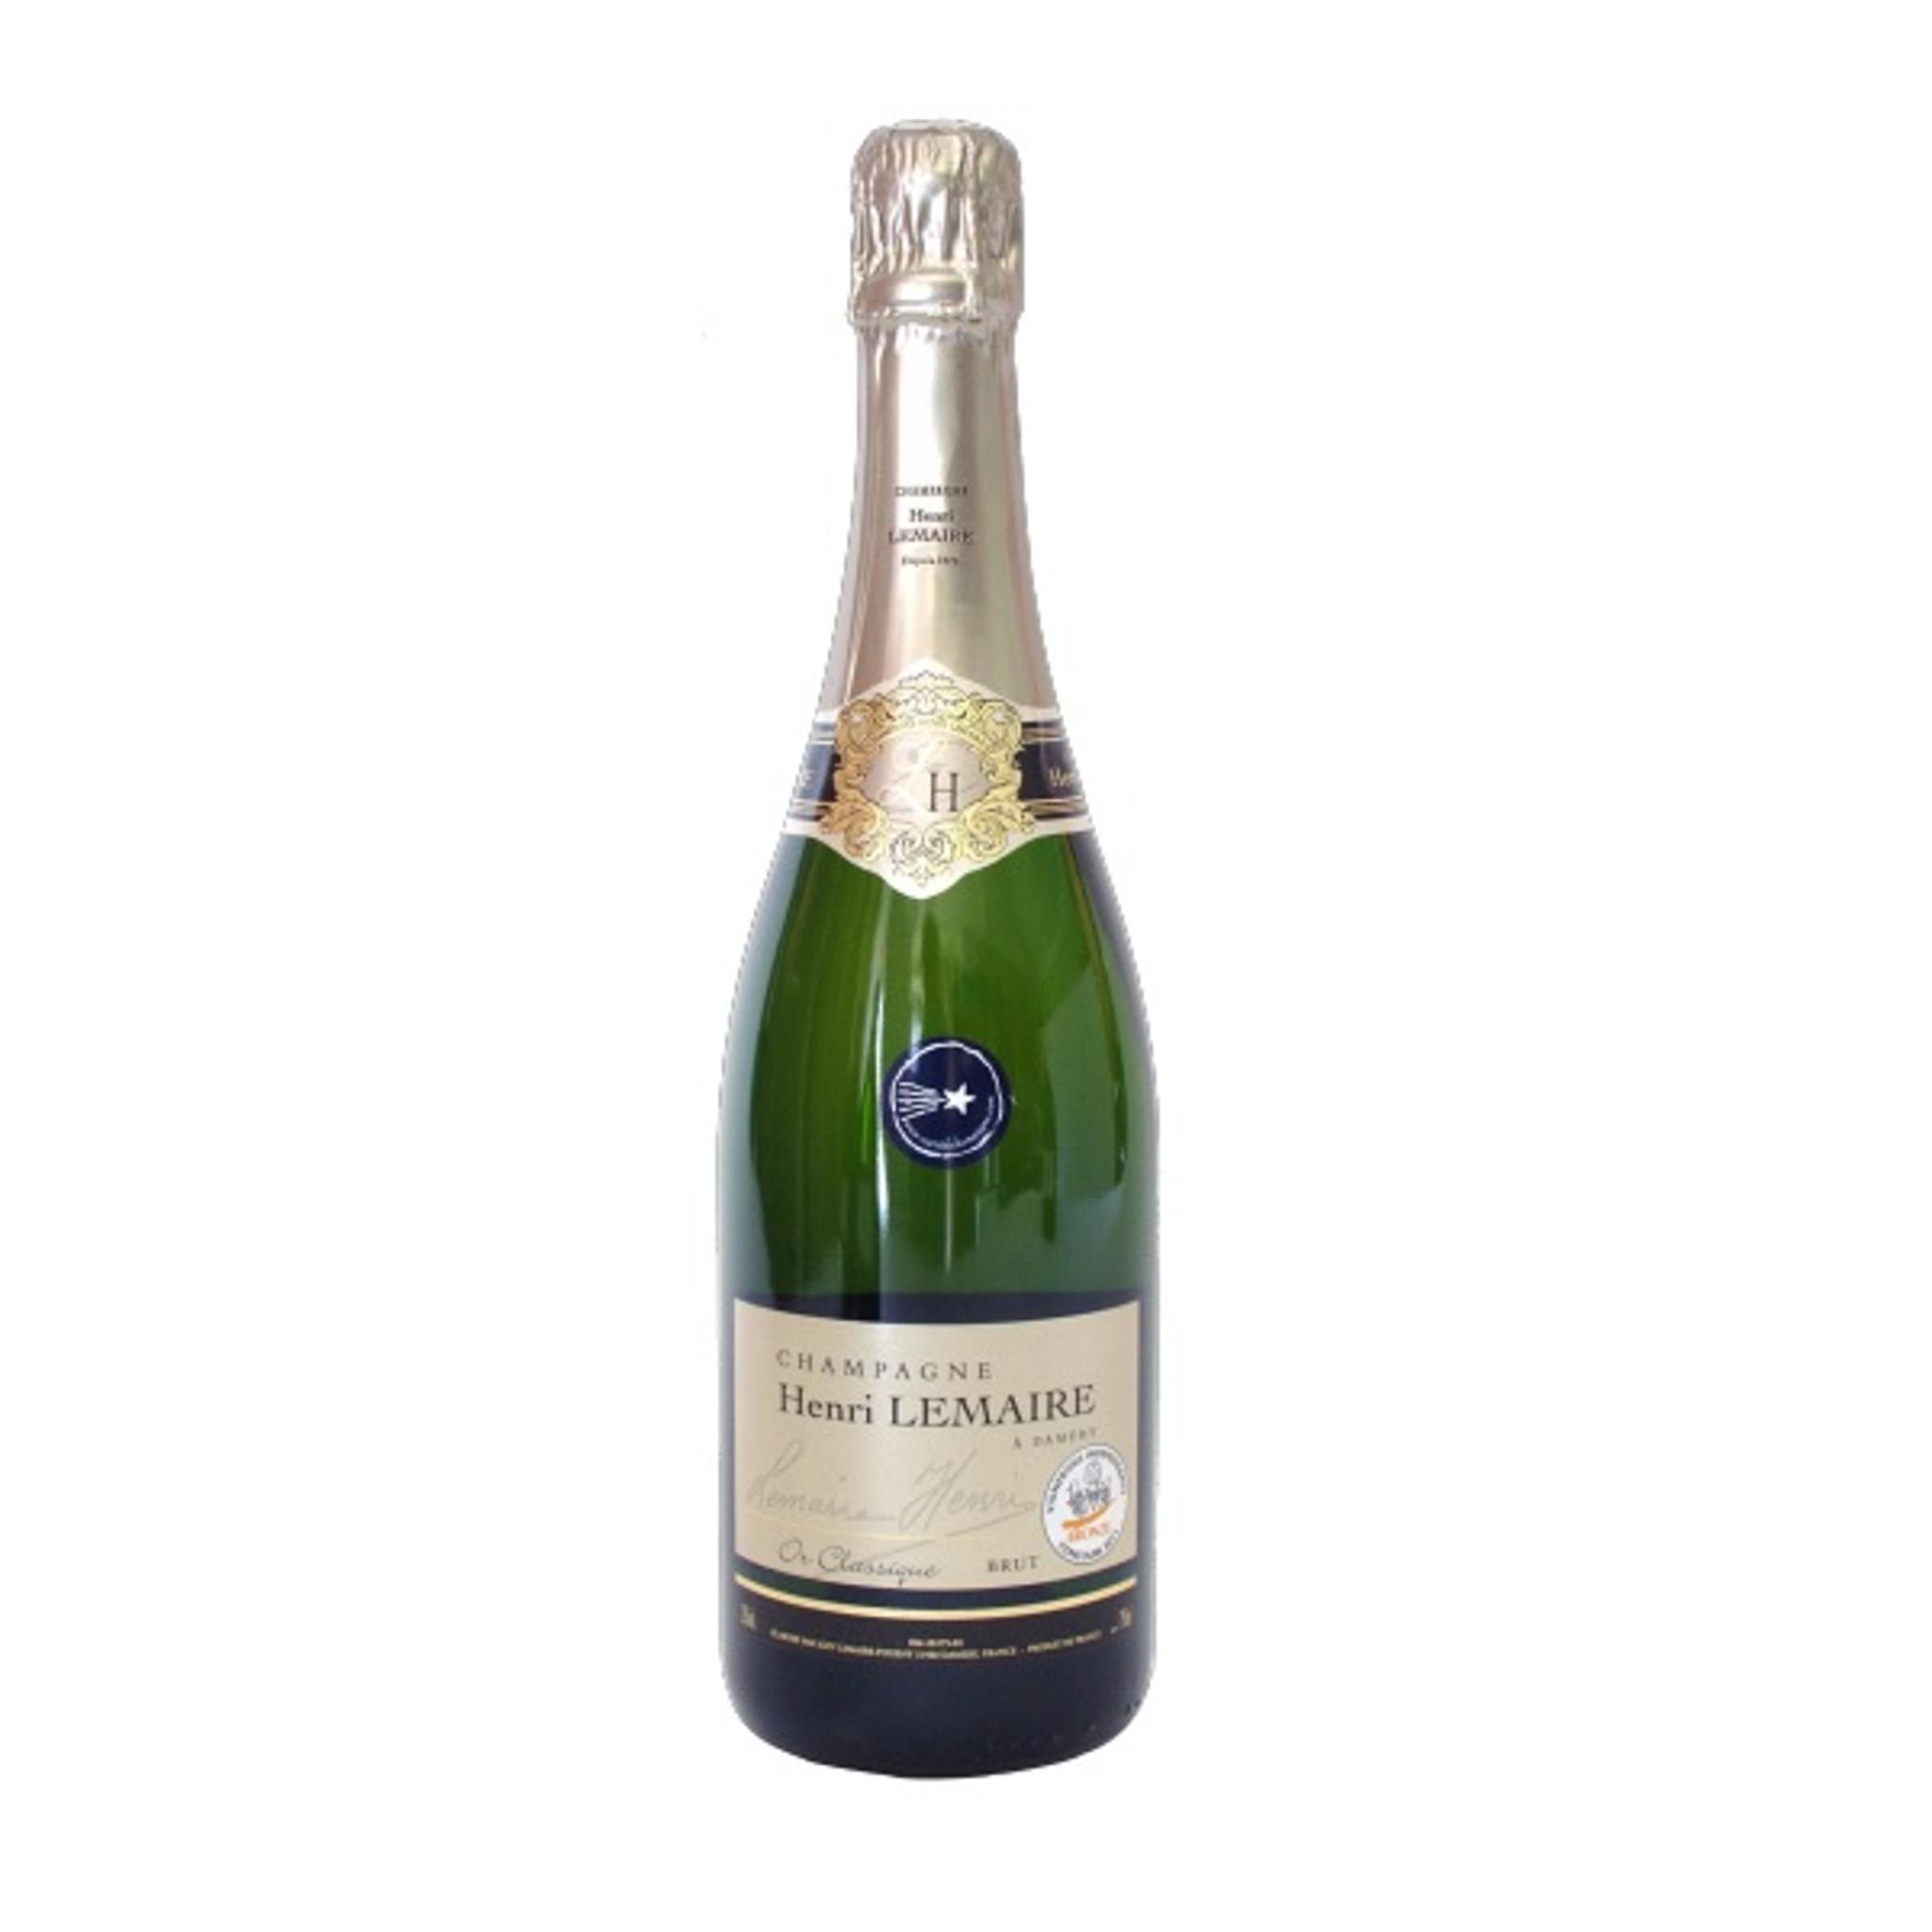 NV Henri Lemaire Or Classique Brut Champagne